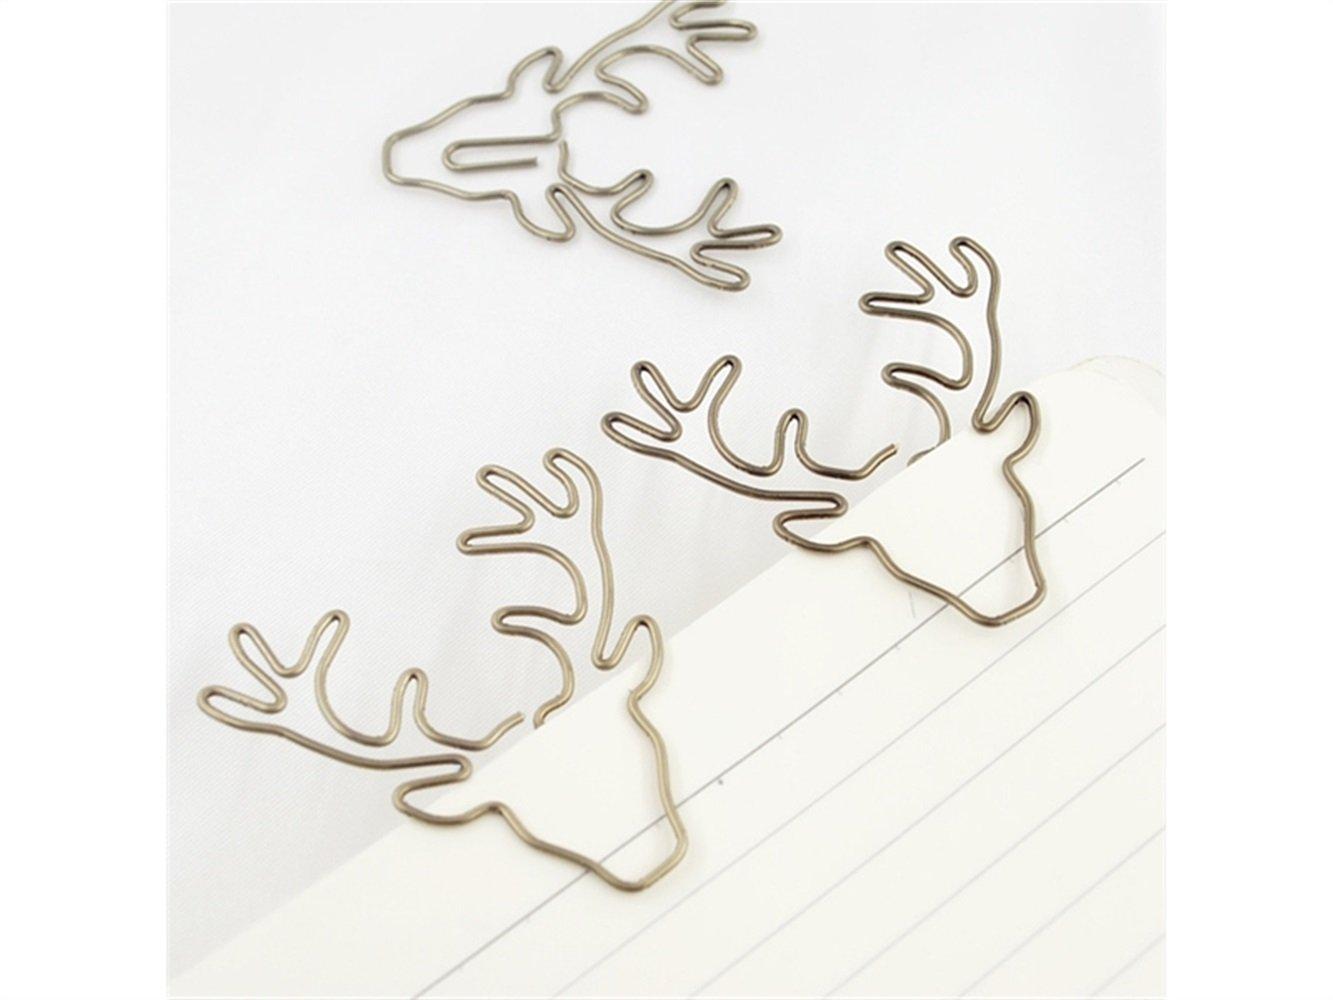 Zhisan Unique Colour 8 Pcs Animal Deer Shape Paper Clip Metal Card File Clip for Office School Stationery Supplies